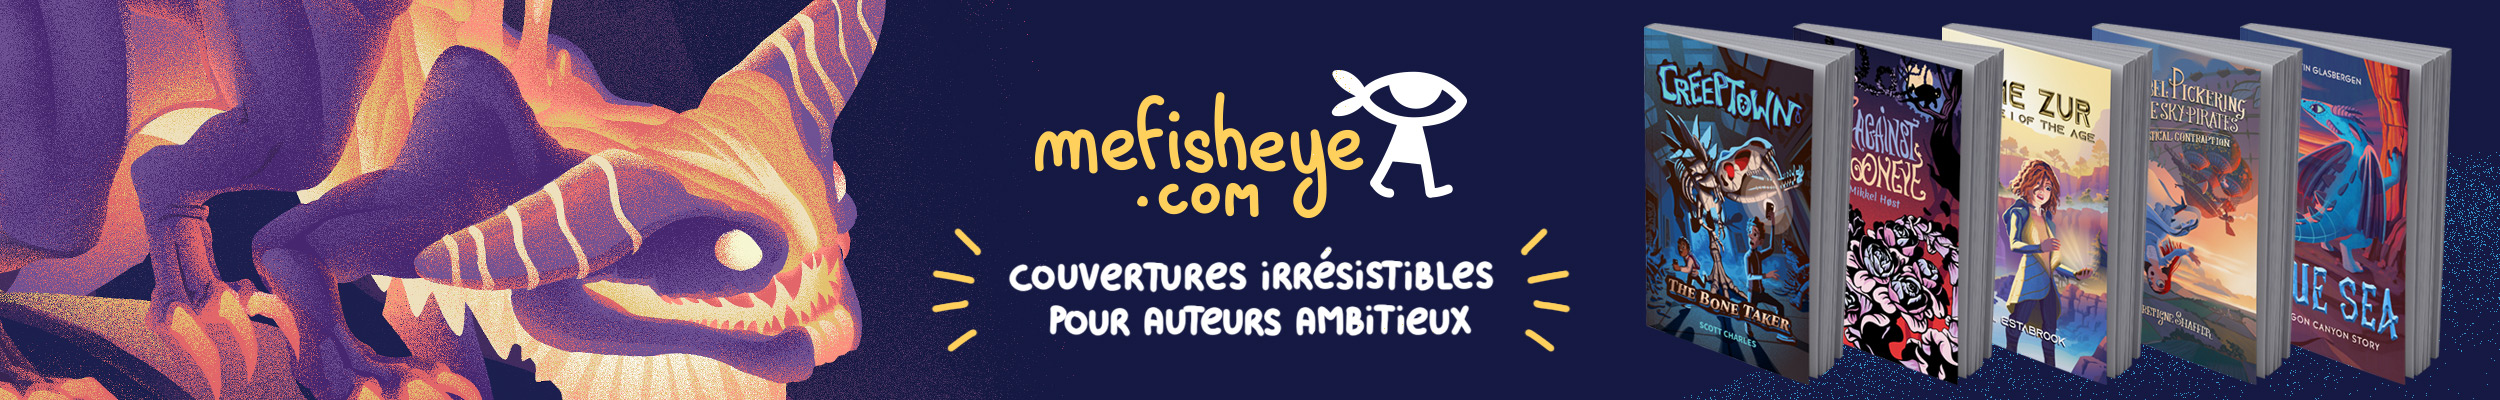 Mefisheye